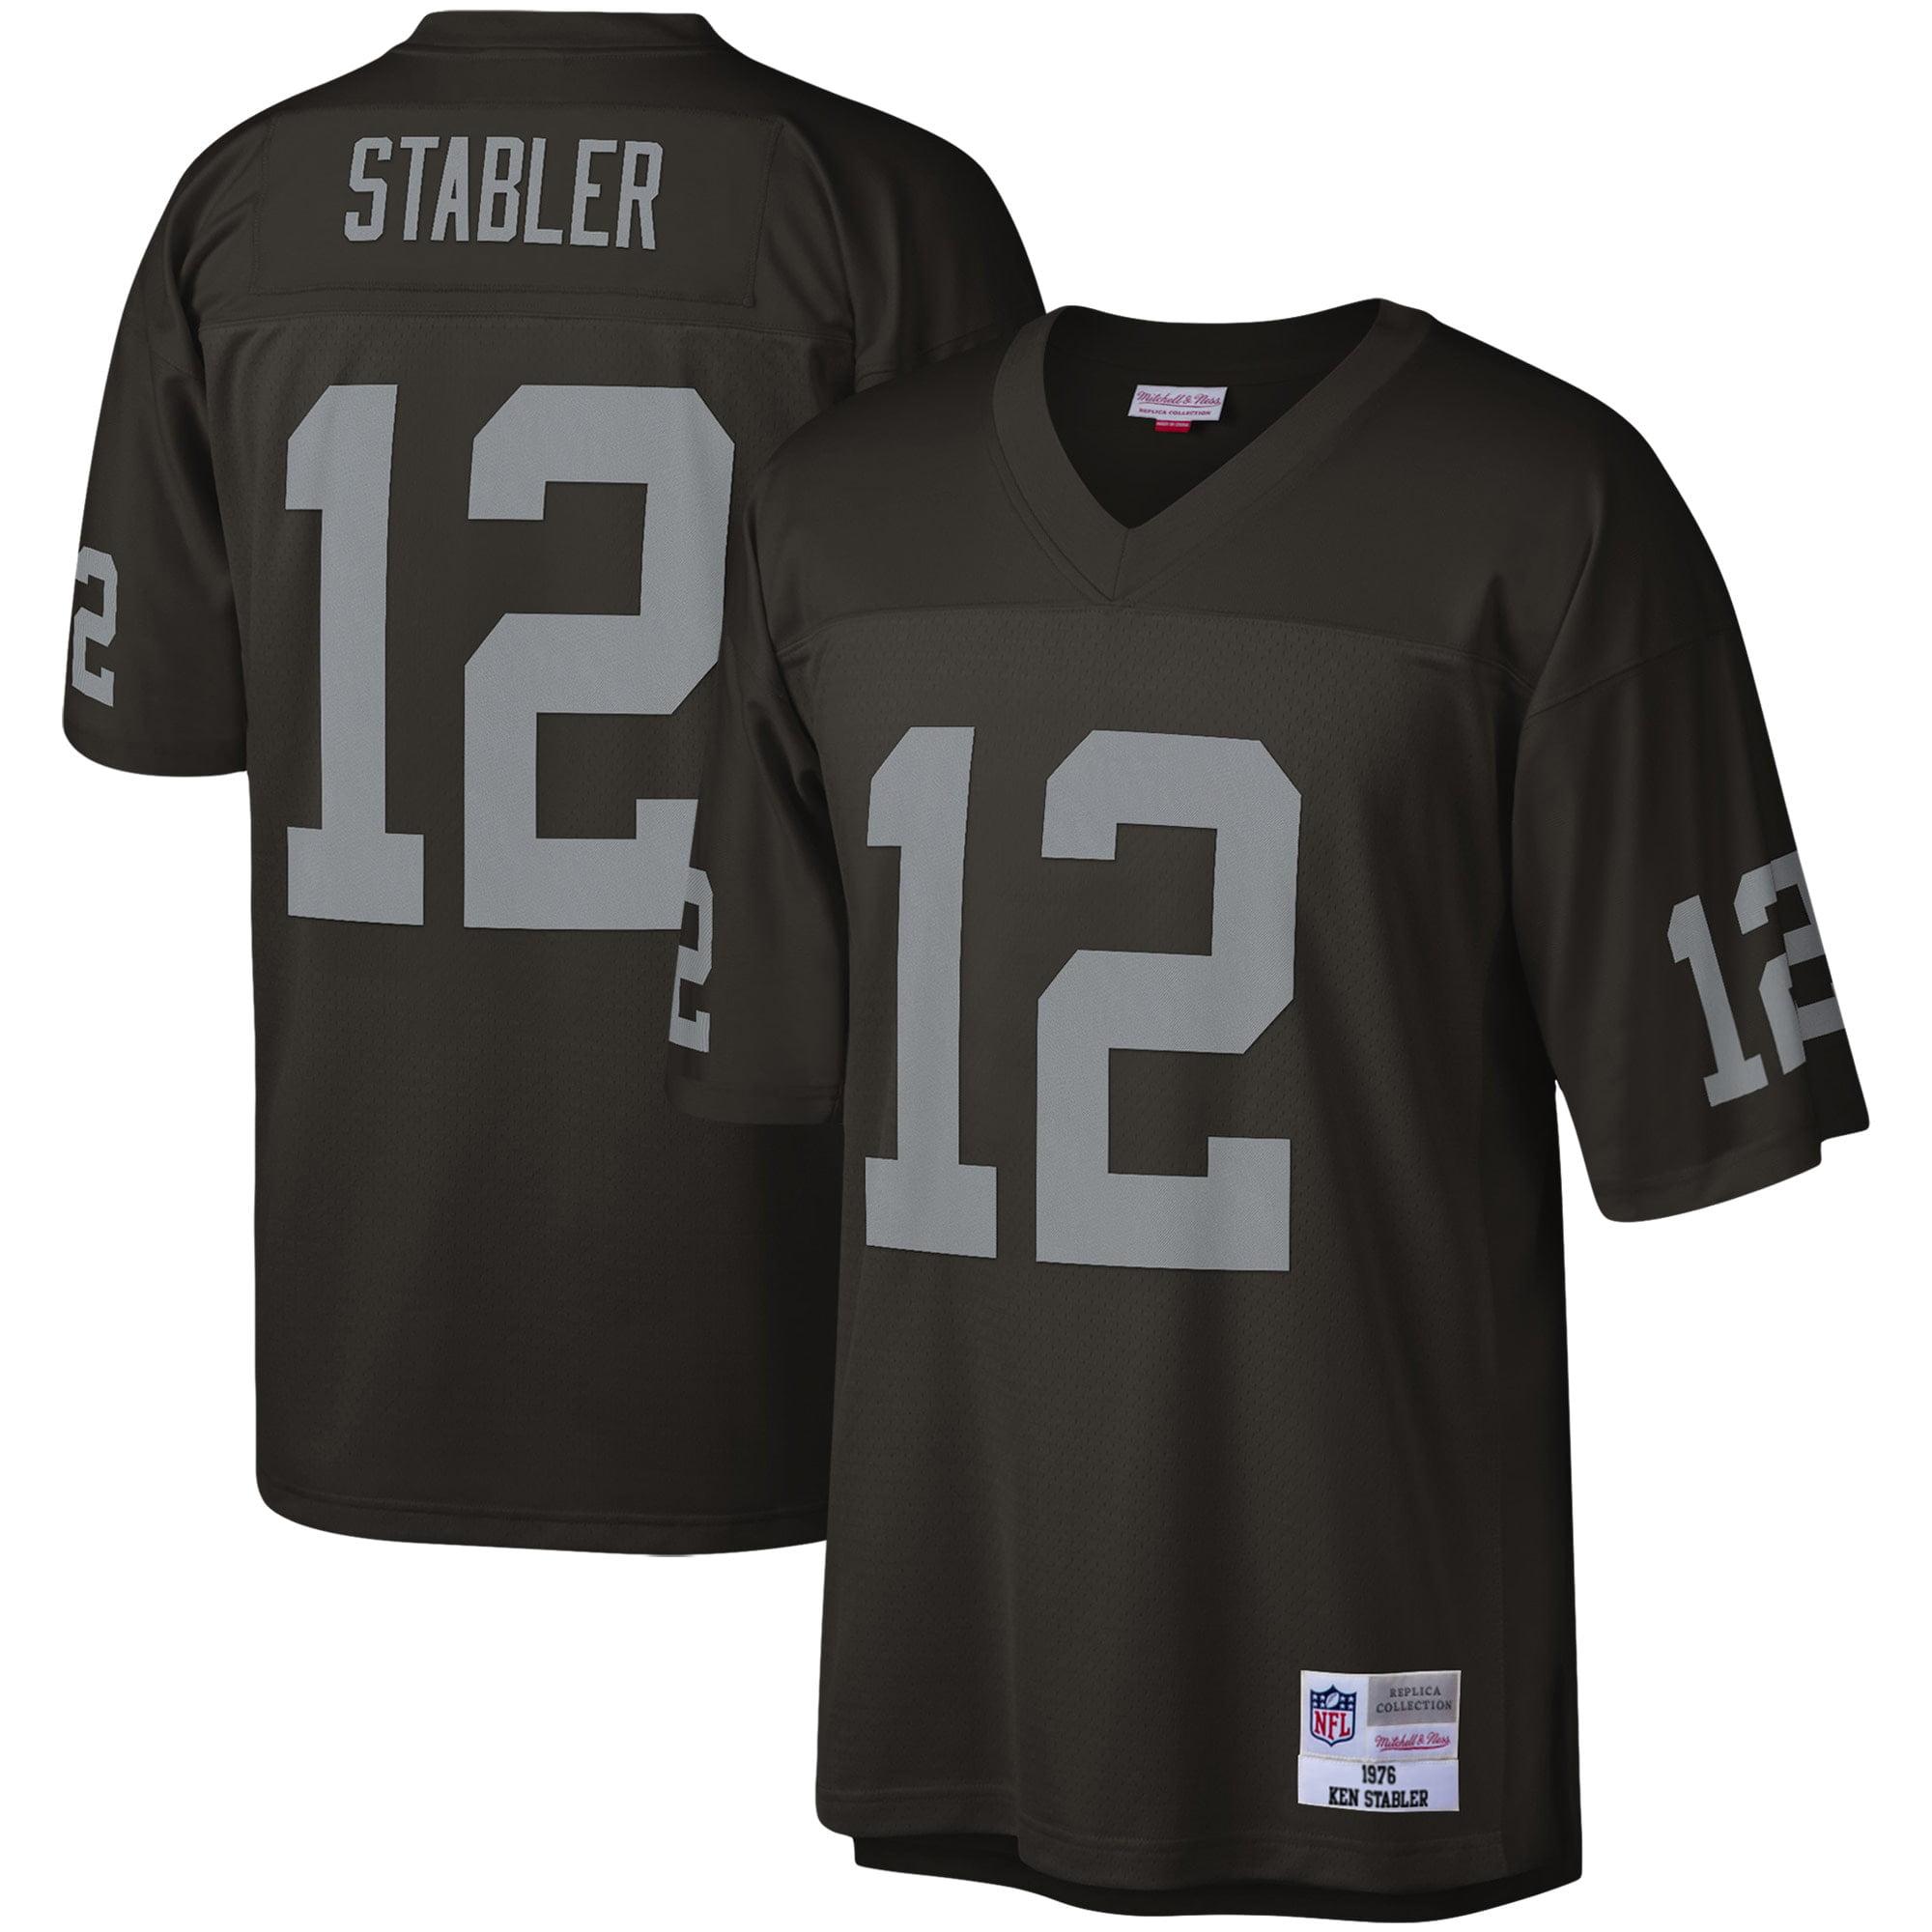 Ken Stabler Las Vegas Raiders Mitchell & Ness Legacy Replica Jersey - Black - Walmart.com